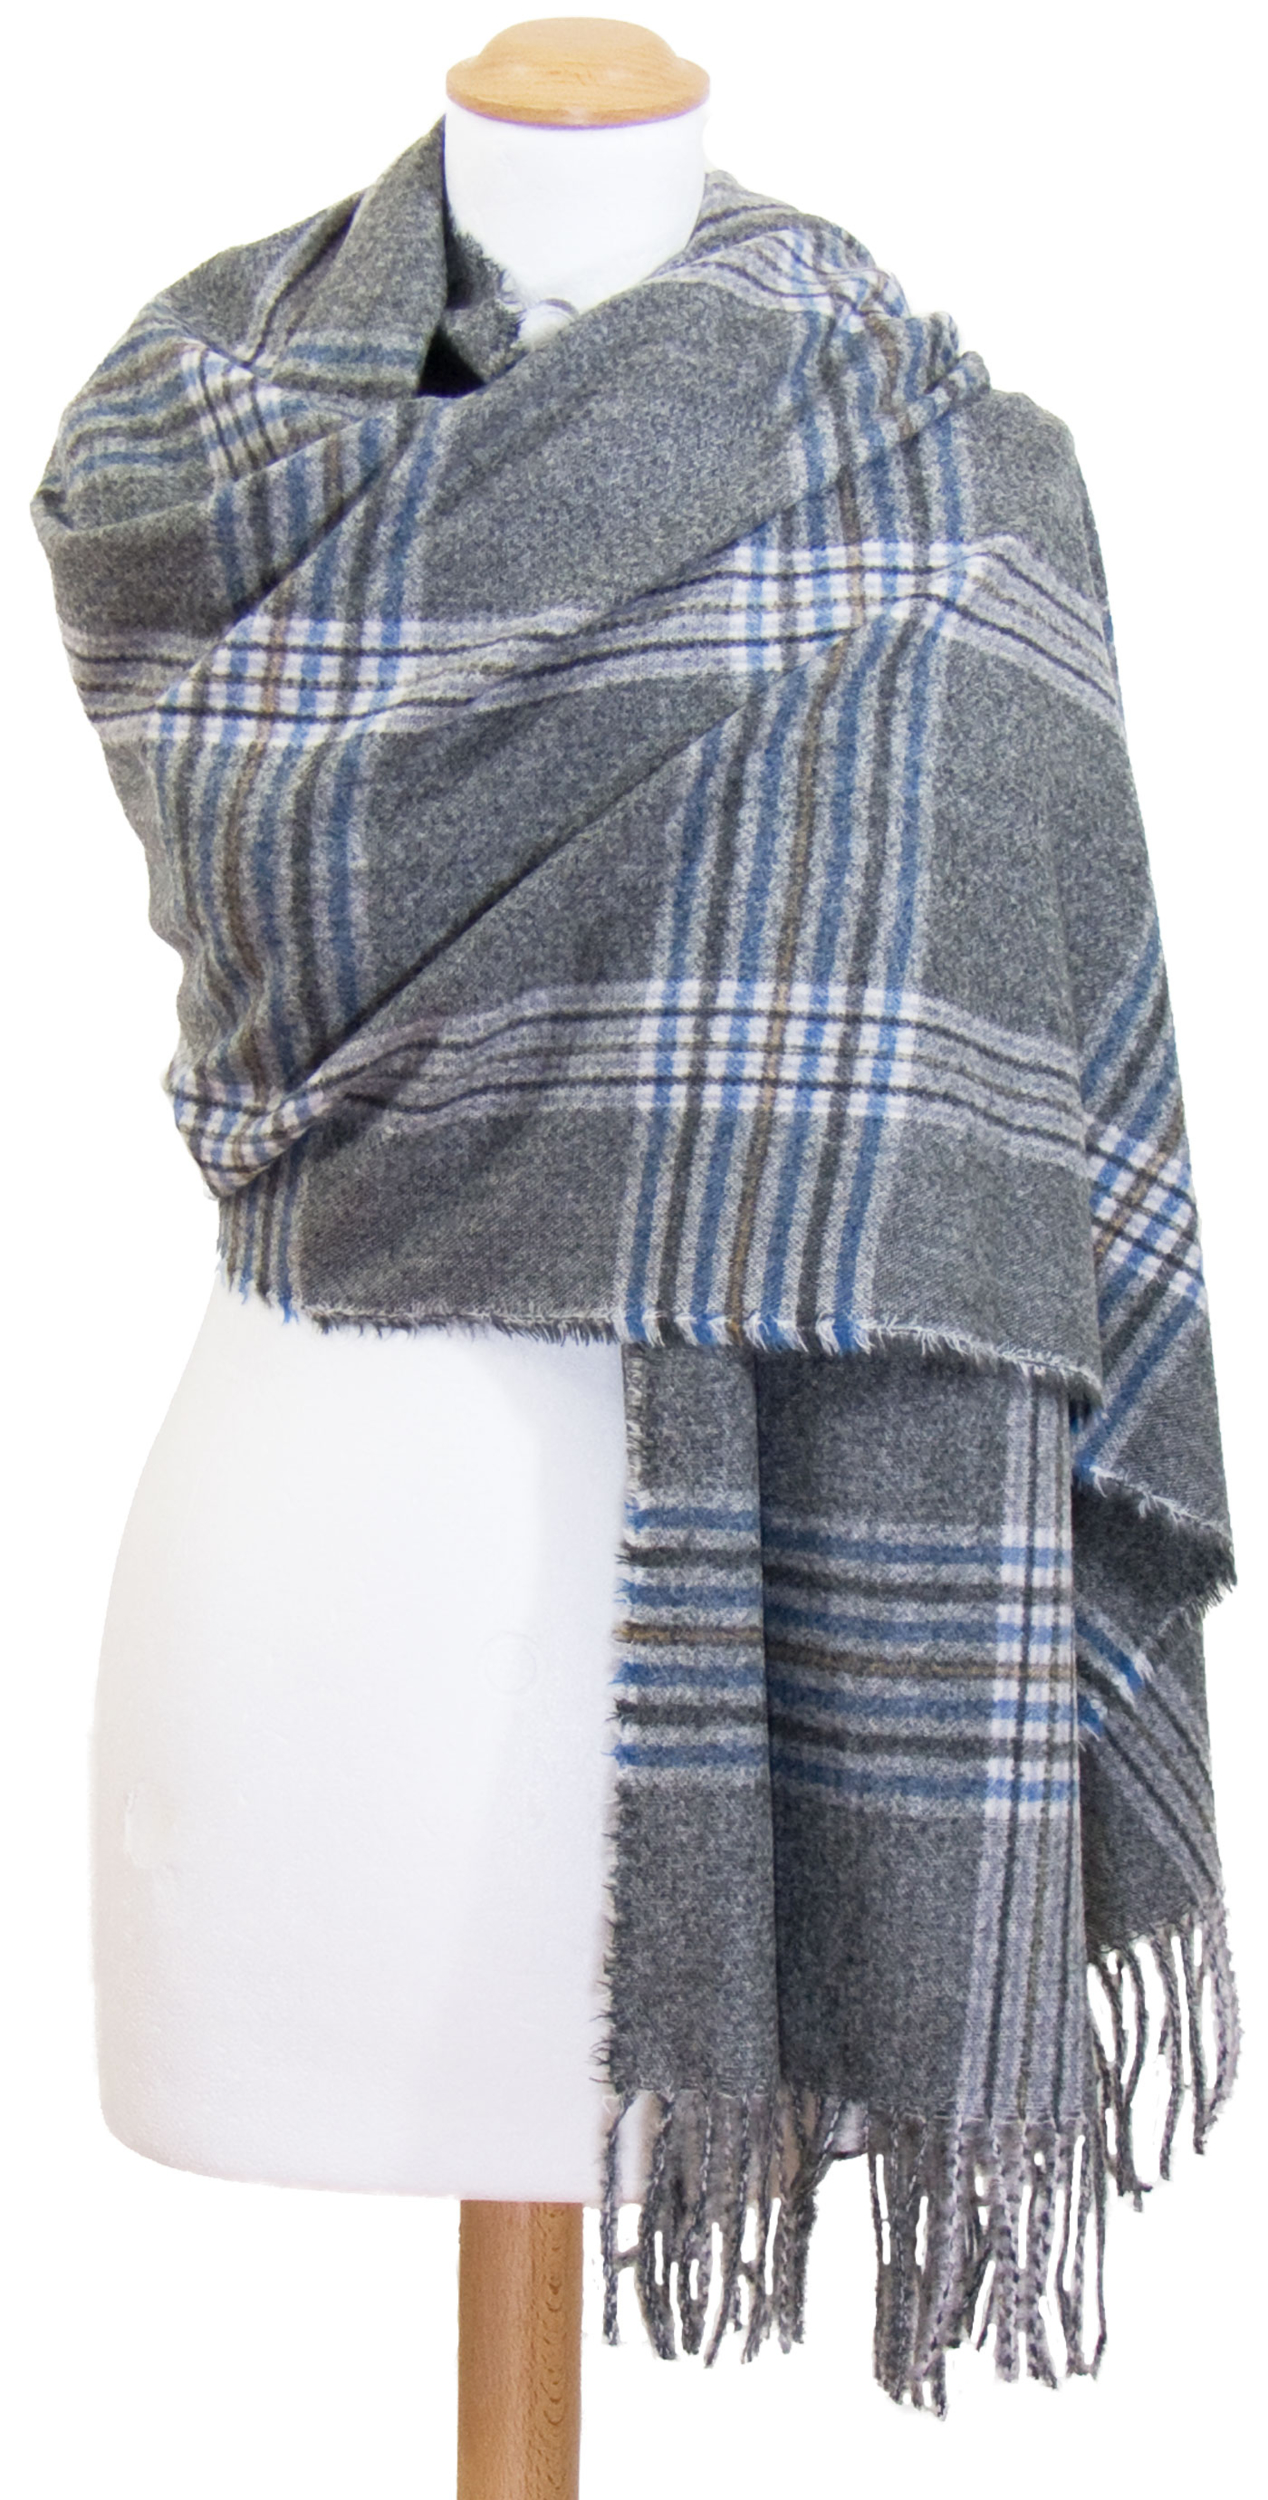 Châle laine gris bleu tartan Kessy